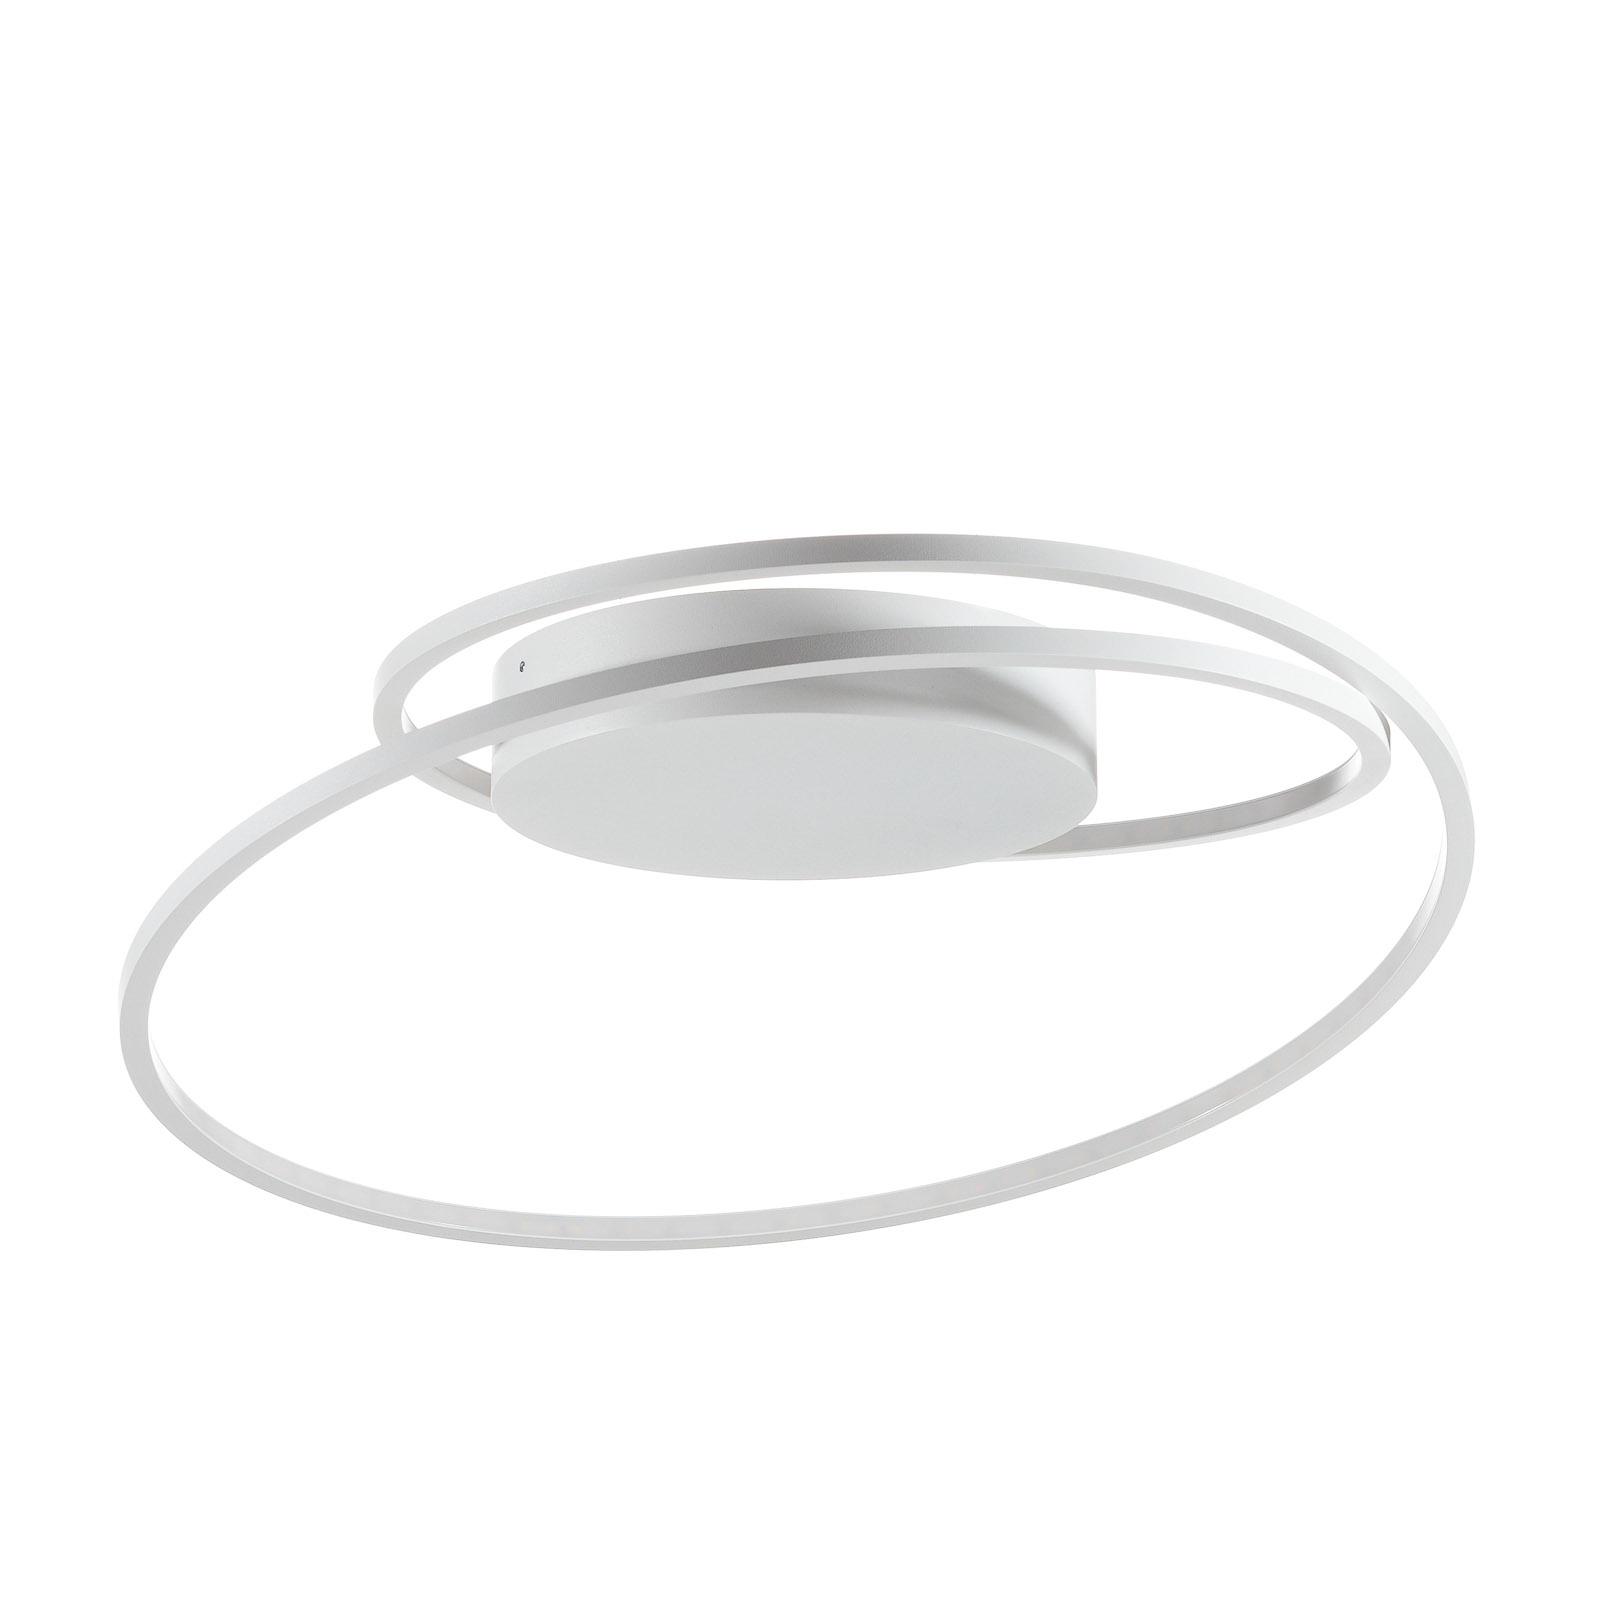 At - esclusiva plafoniera LED bianca